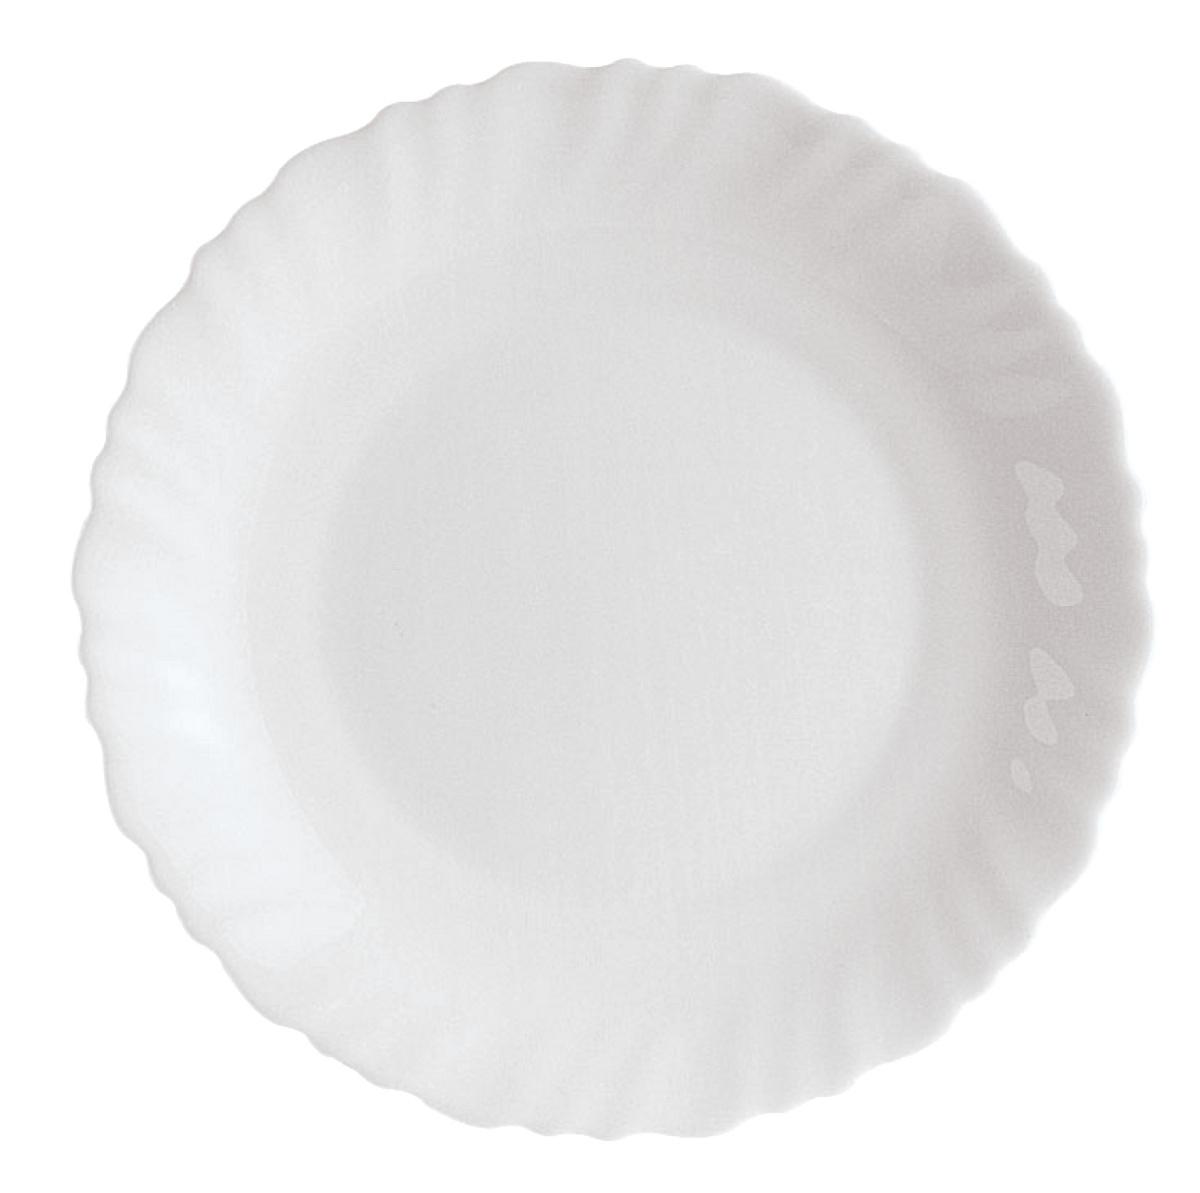 Assiette plate rond blanc Feston Arcoroc